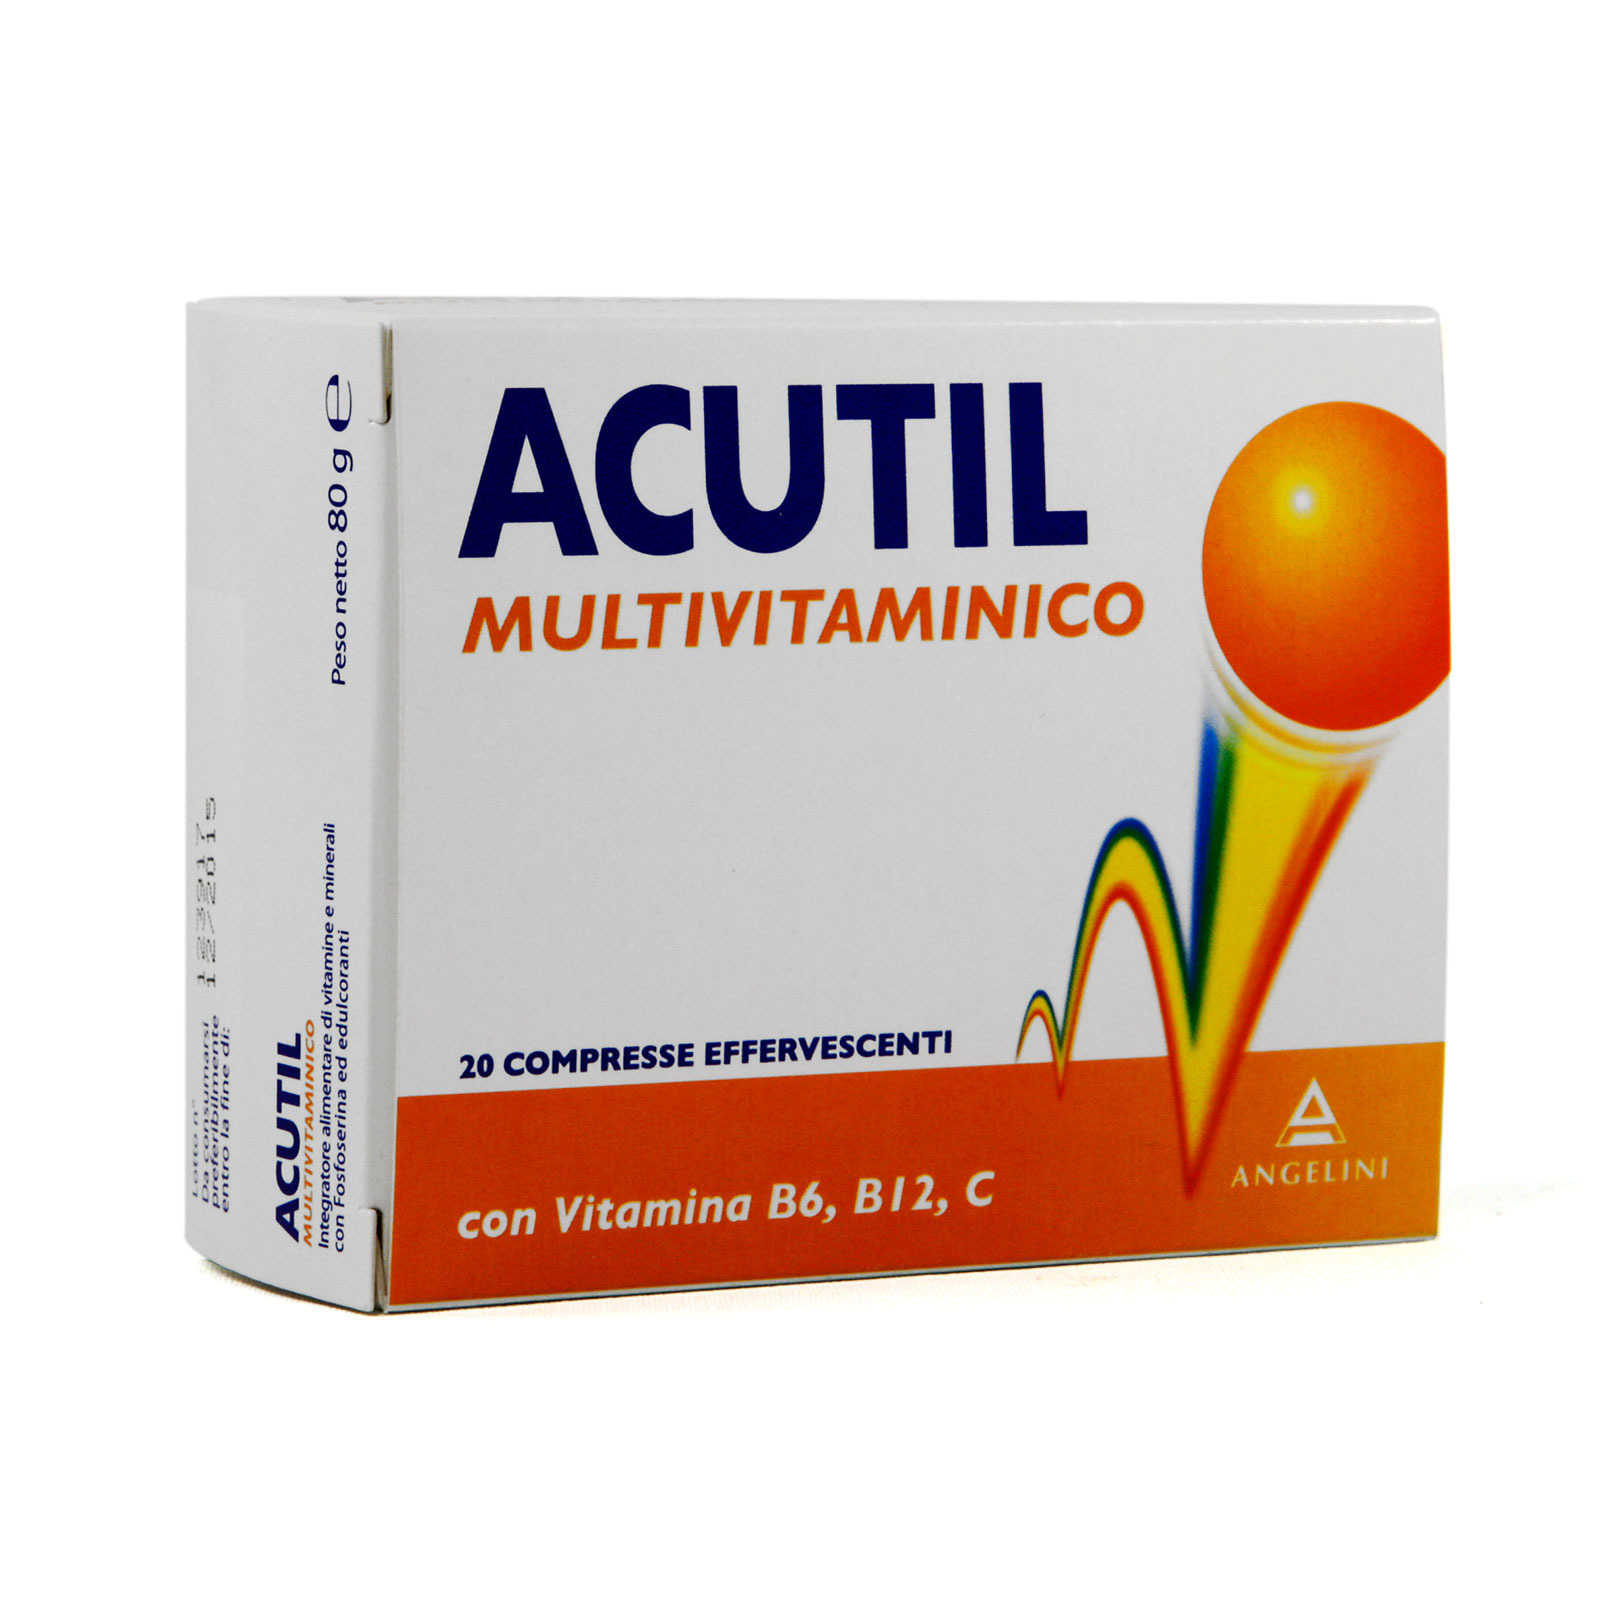 Acutil - Integratore Multivitaminico - Compresse Effervescenti